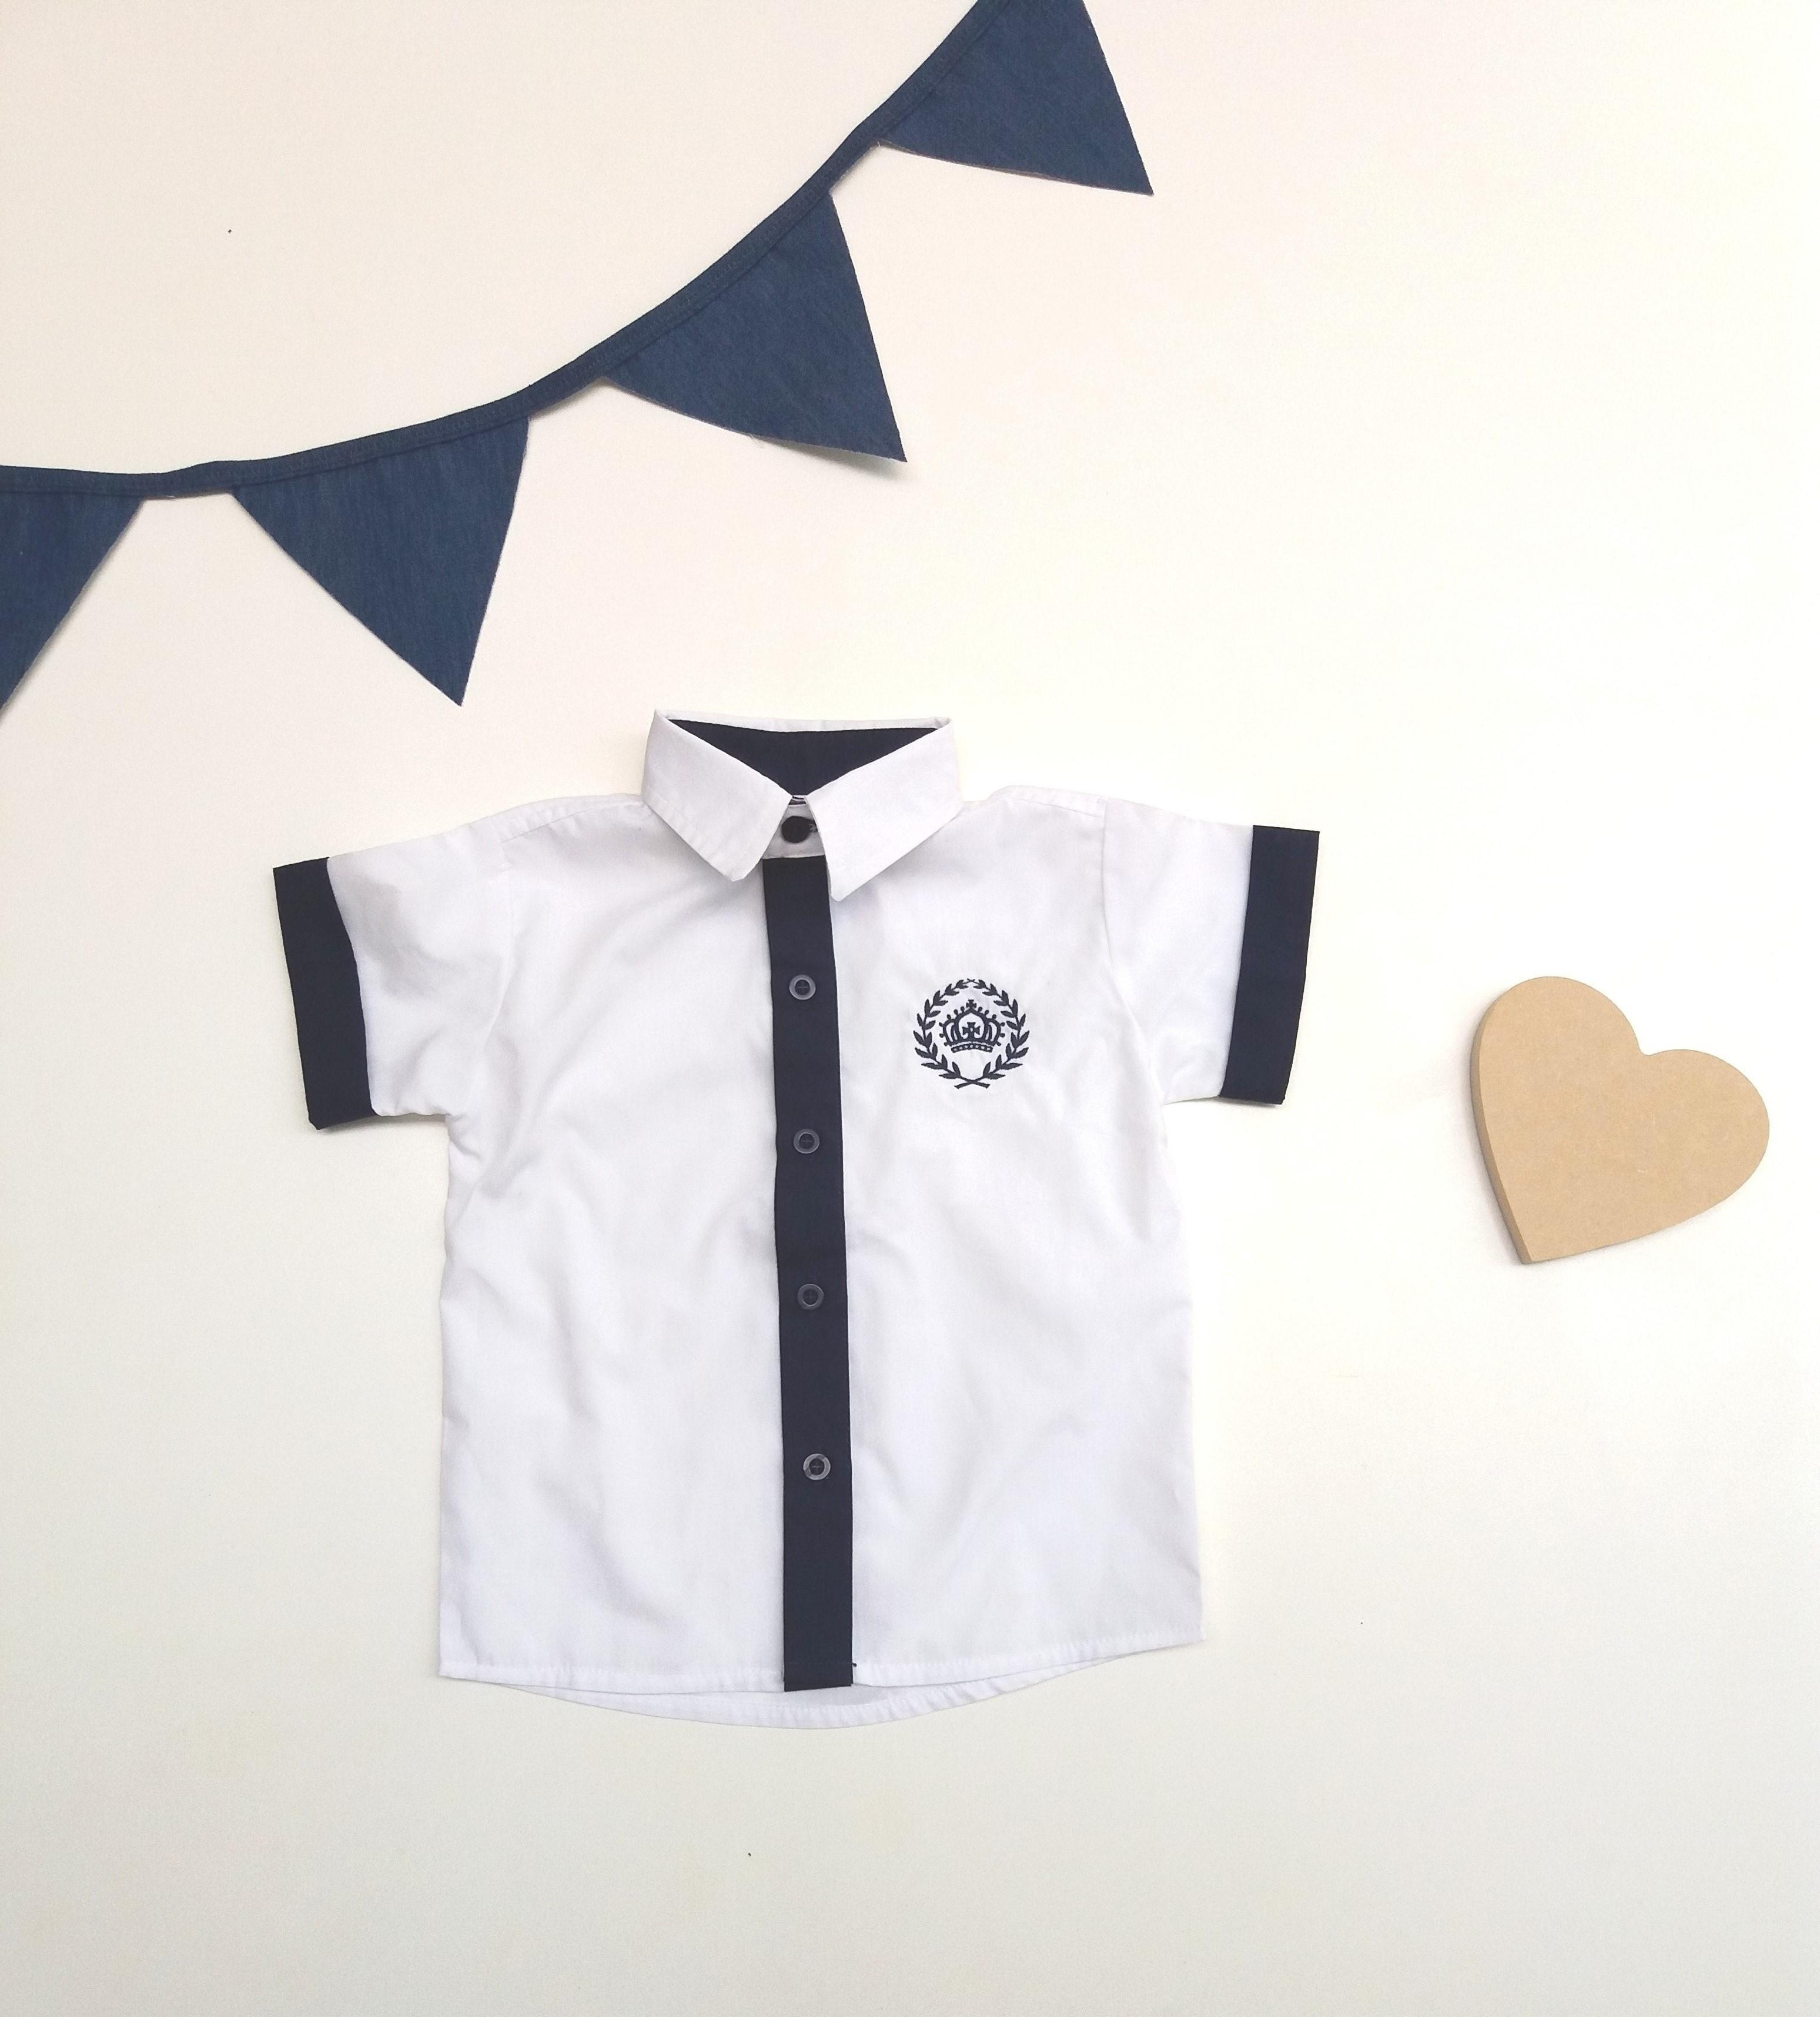 Camisa Xadrez Infantil Manga Curta  3bf6e03a83bf4